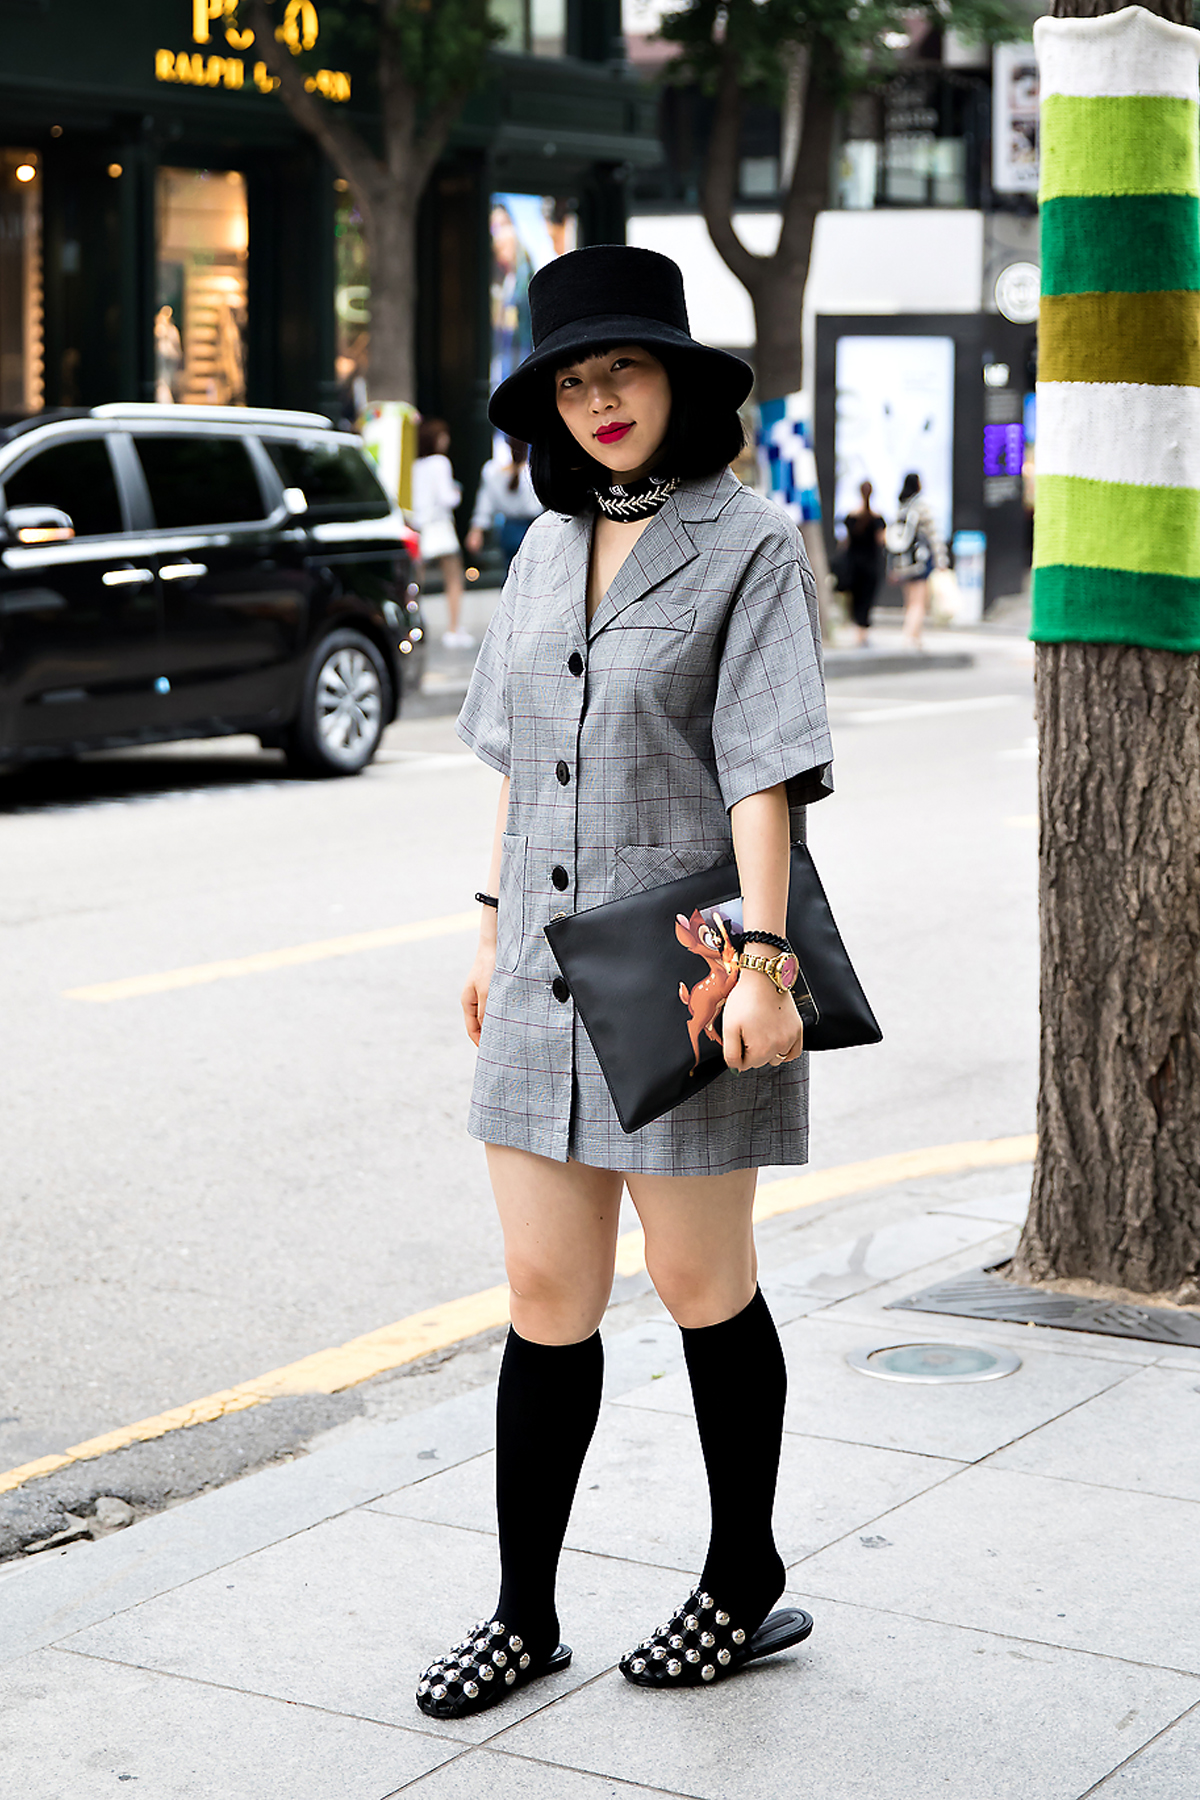 Maomao, Street Fashion 2017 in Seoul